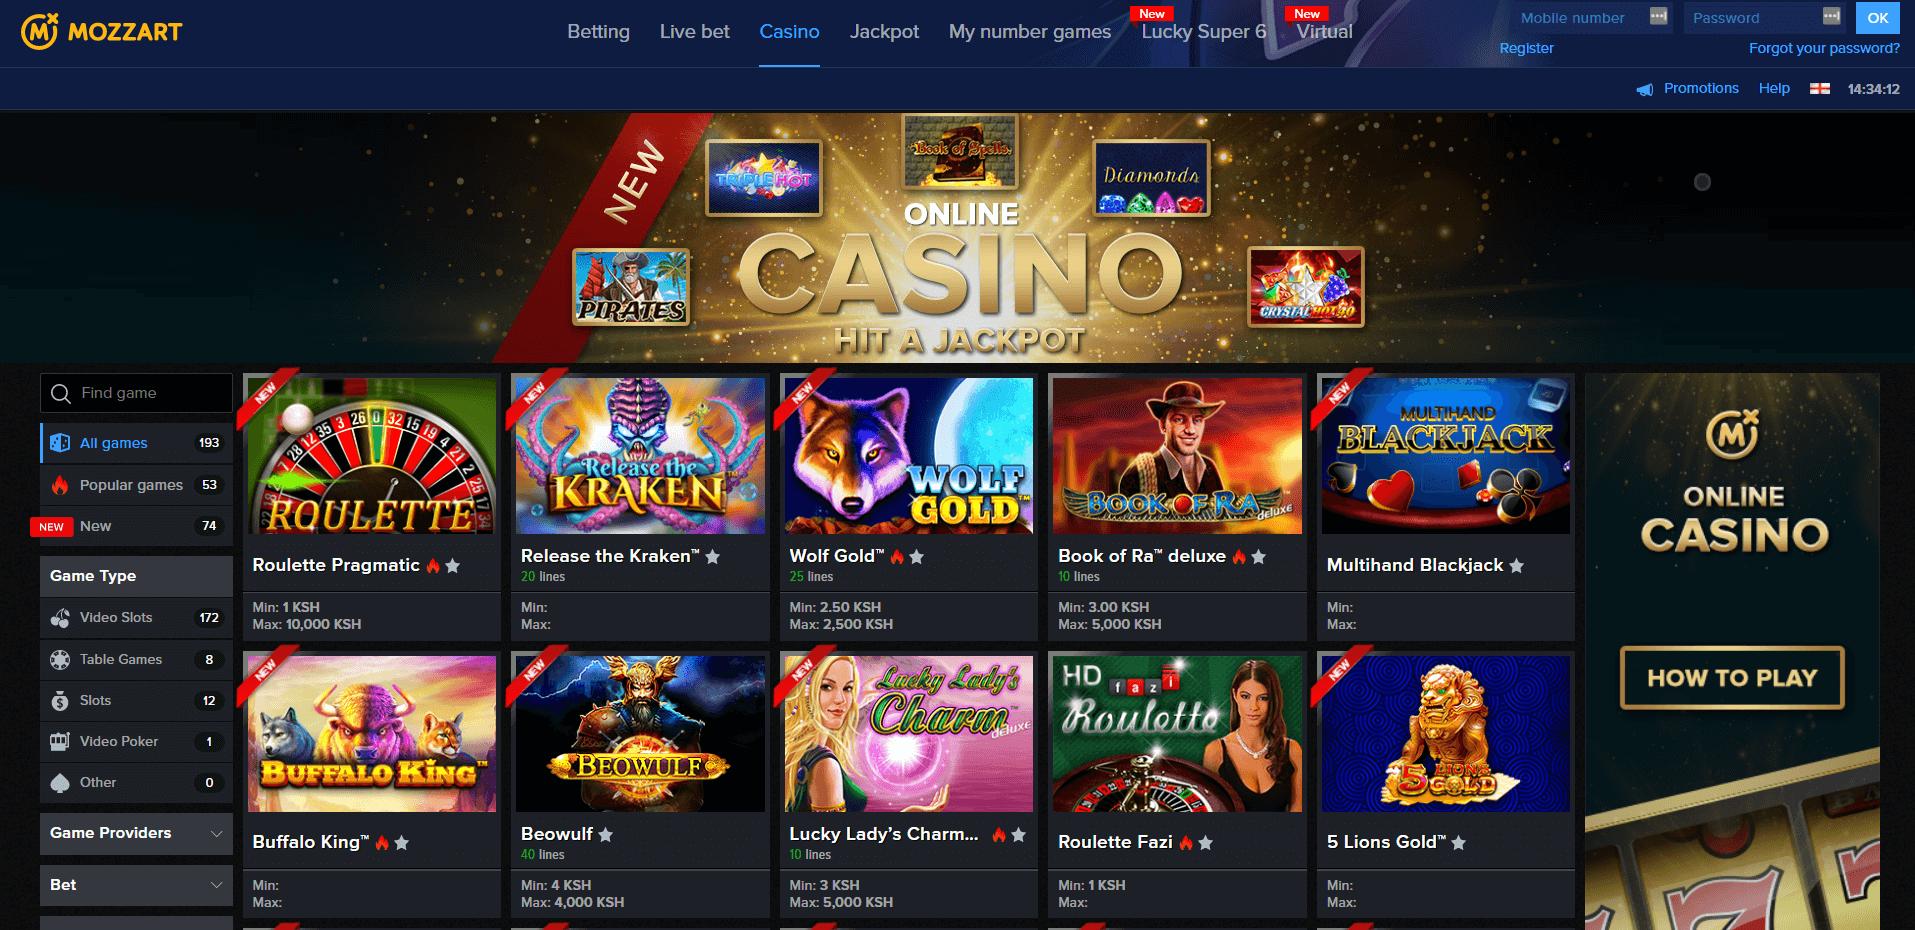 mozzartbet casino homepage